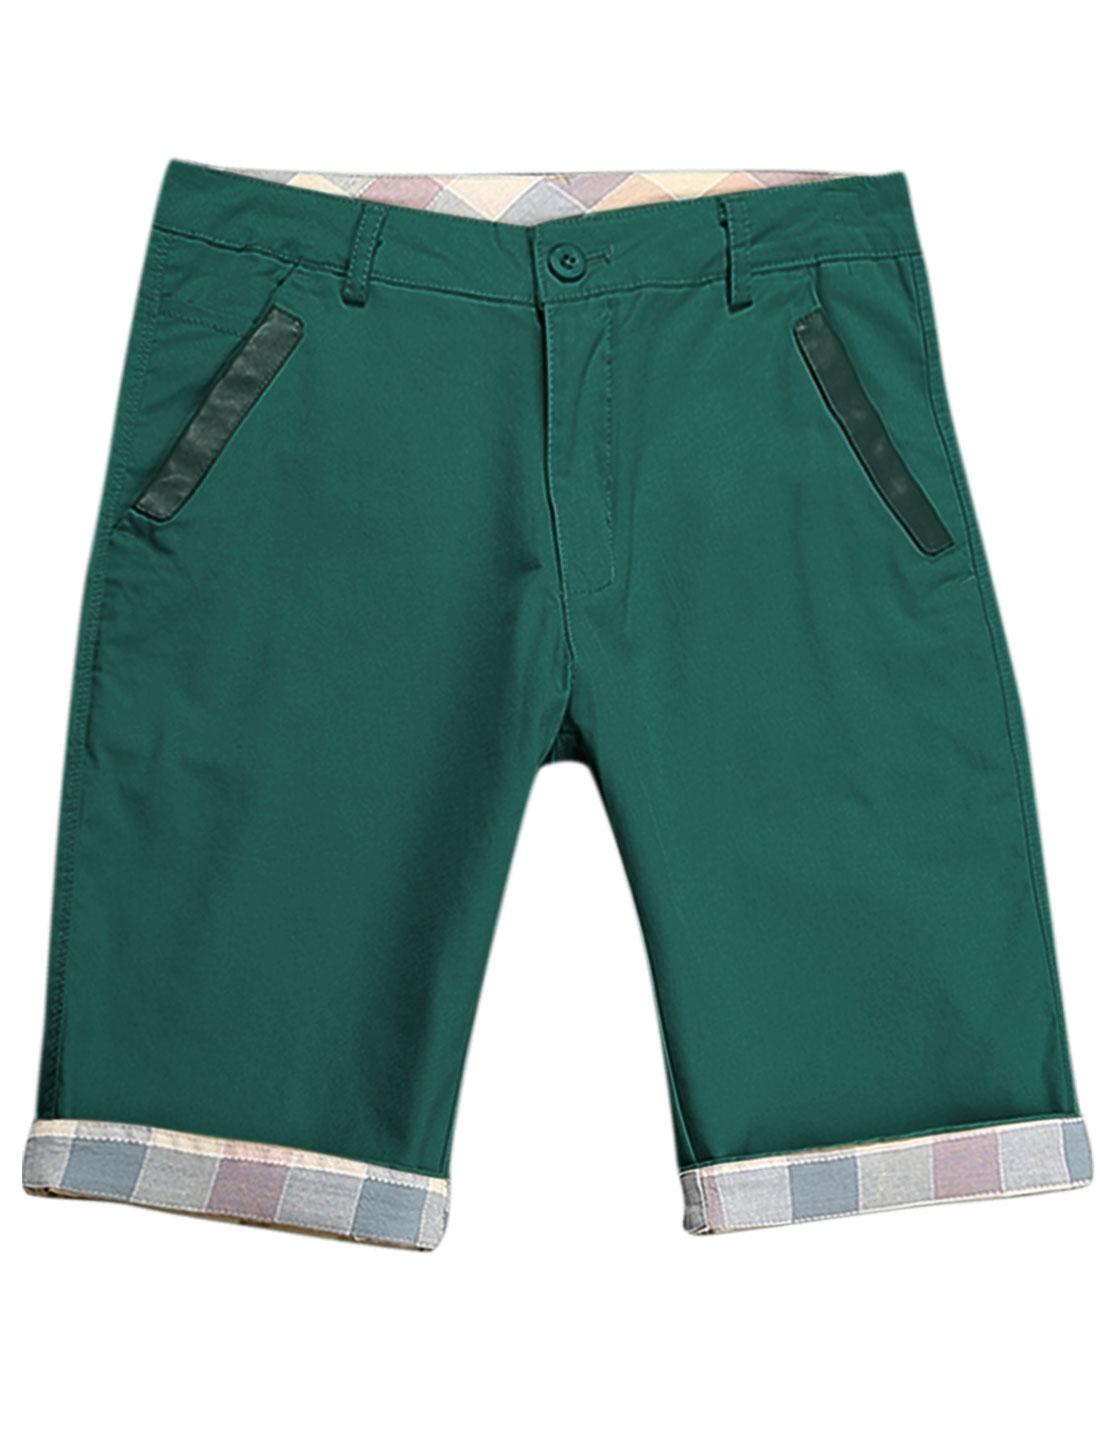 Men Argyle Pattern Detail Belt Loop Slant Pockets Leisure Shorts Dark Green W32